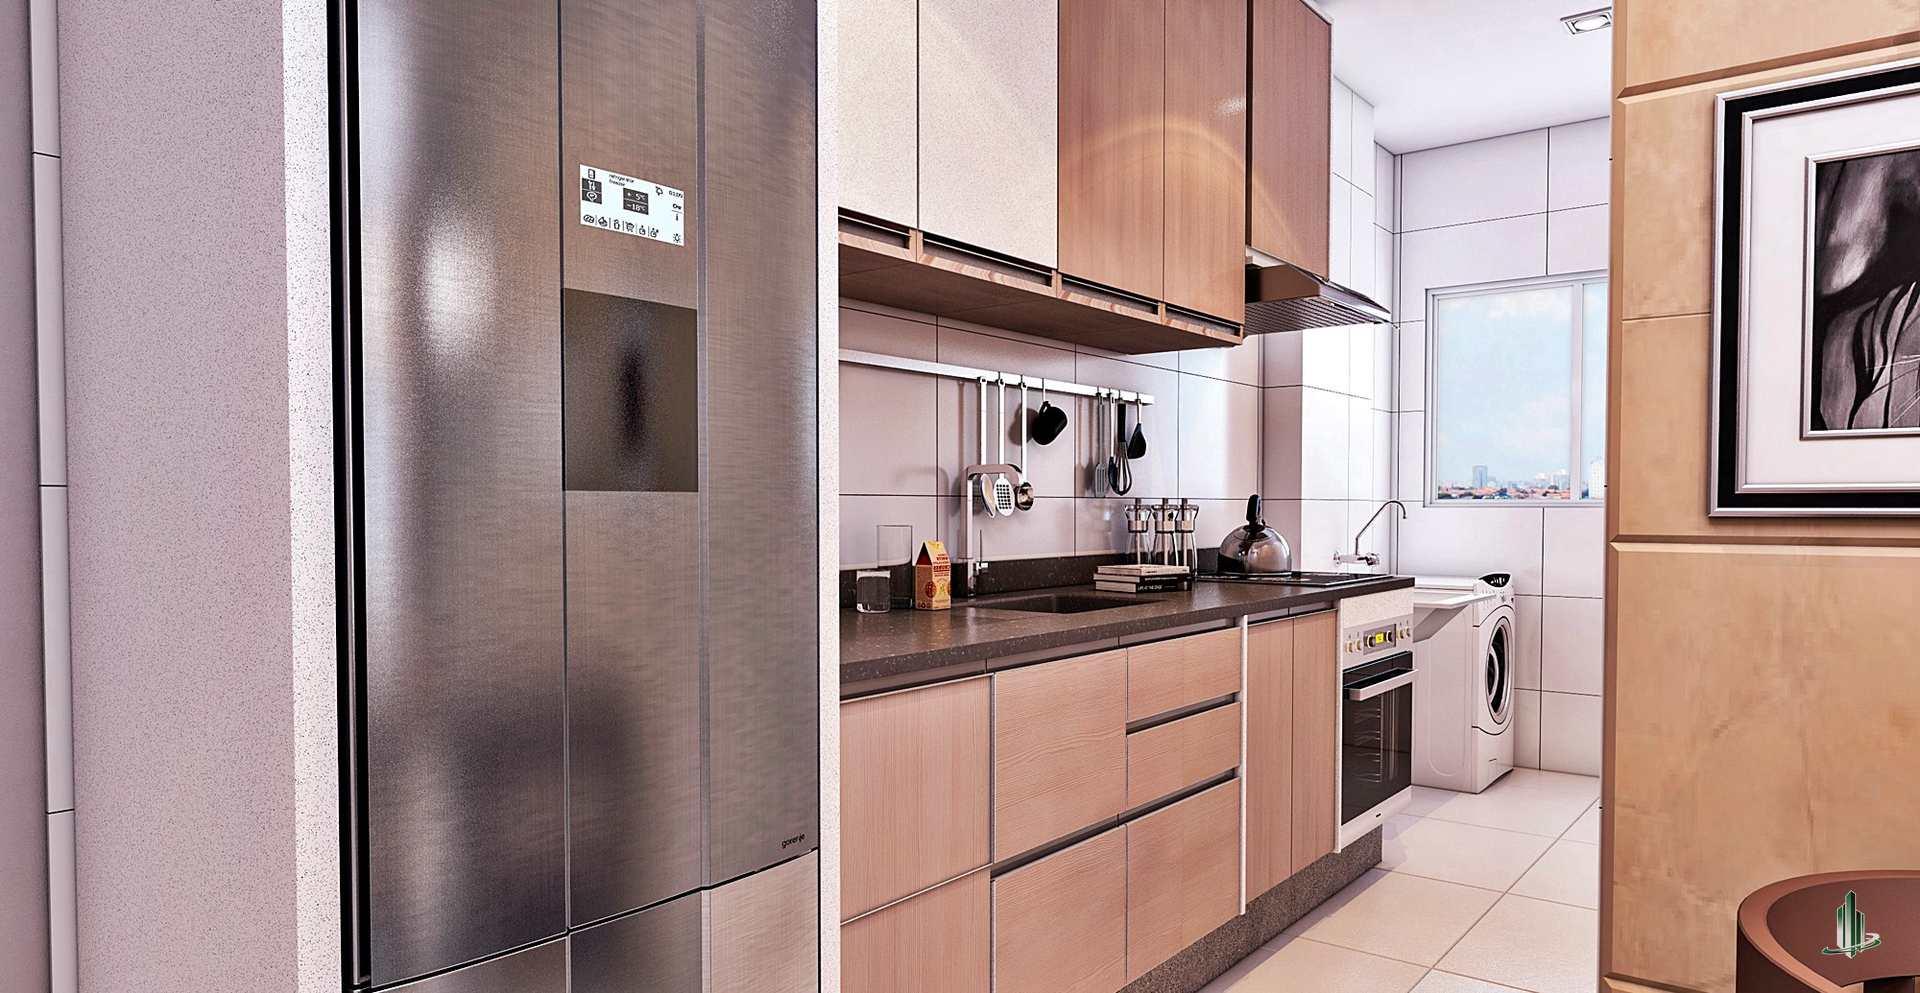 Cozinha-Ap-Credlar-Anita-Malfatti-editado-